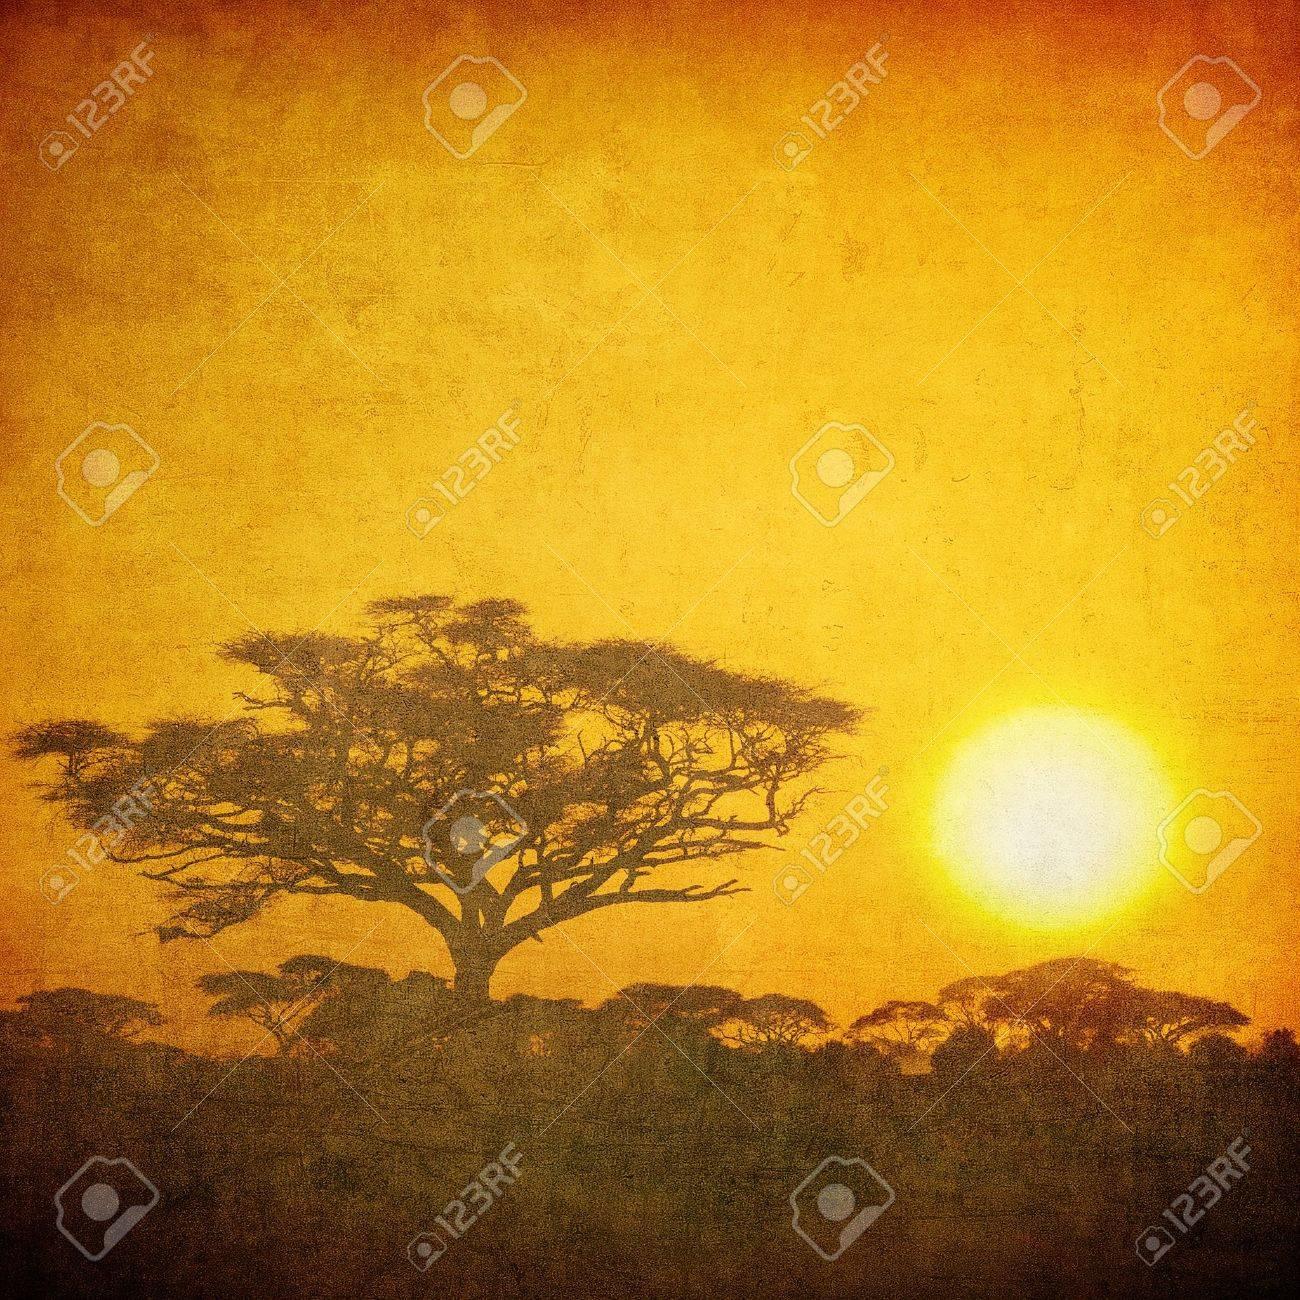 grunge image of a tree in savannah Stock Photo - 12084054